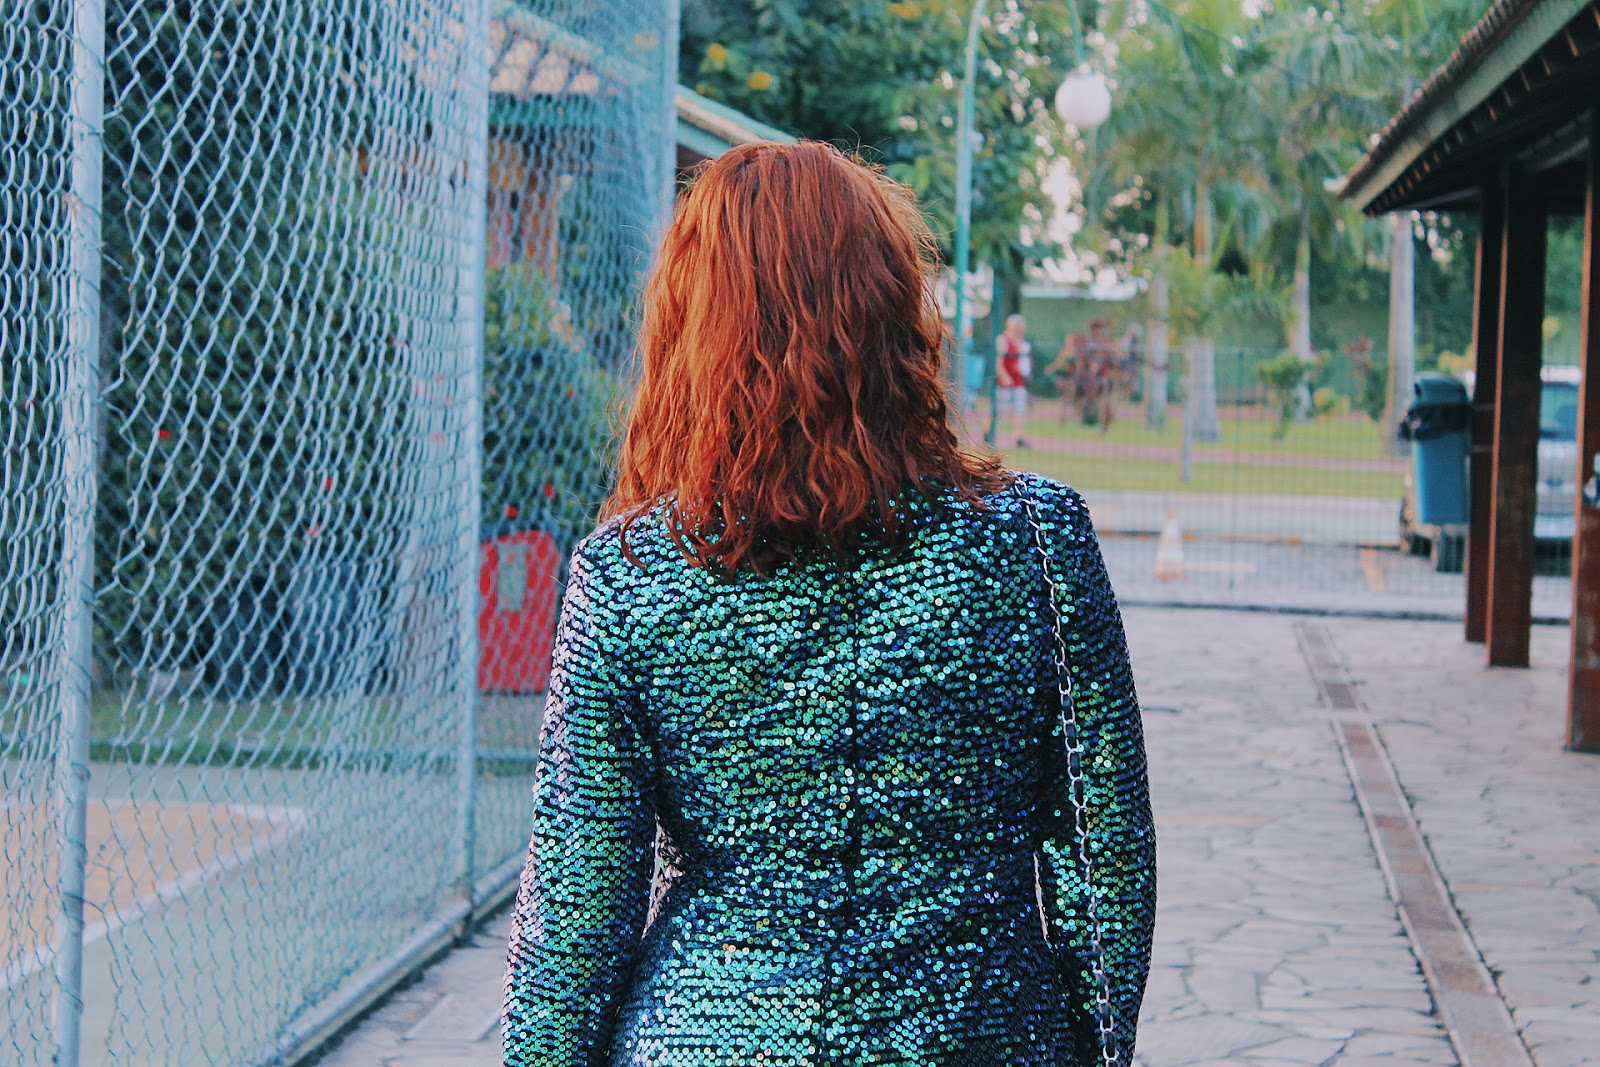 look brilho, look glitter, look paetê, macaquinho verde azul furtacor, macaquinho sereia, look hera venenosa, look da china, paetês verdes, look ruiva, ruiva de verde, cabelo ondulado ruivo